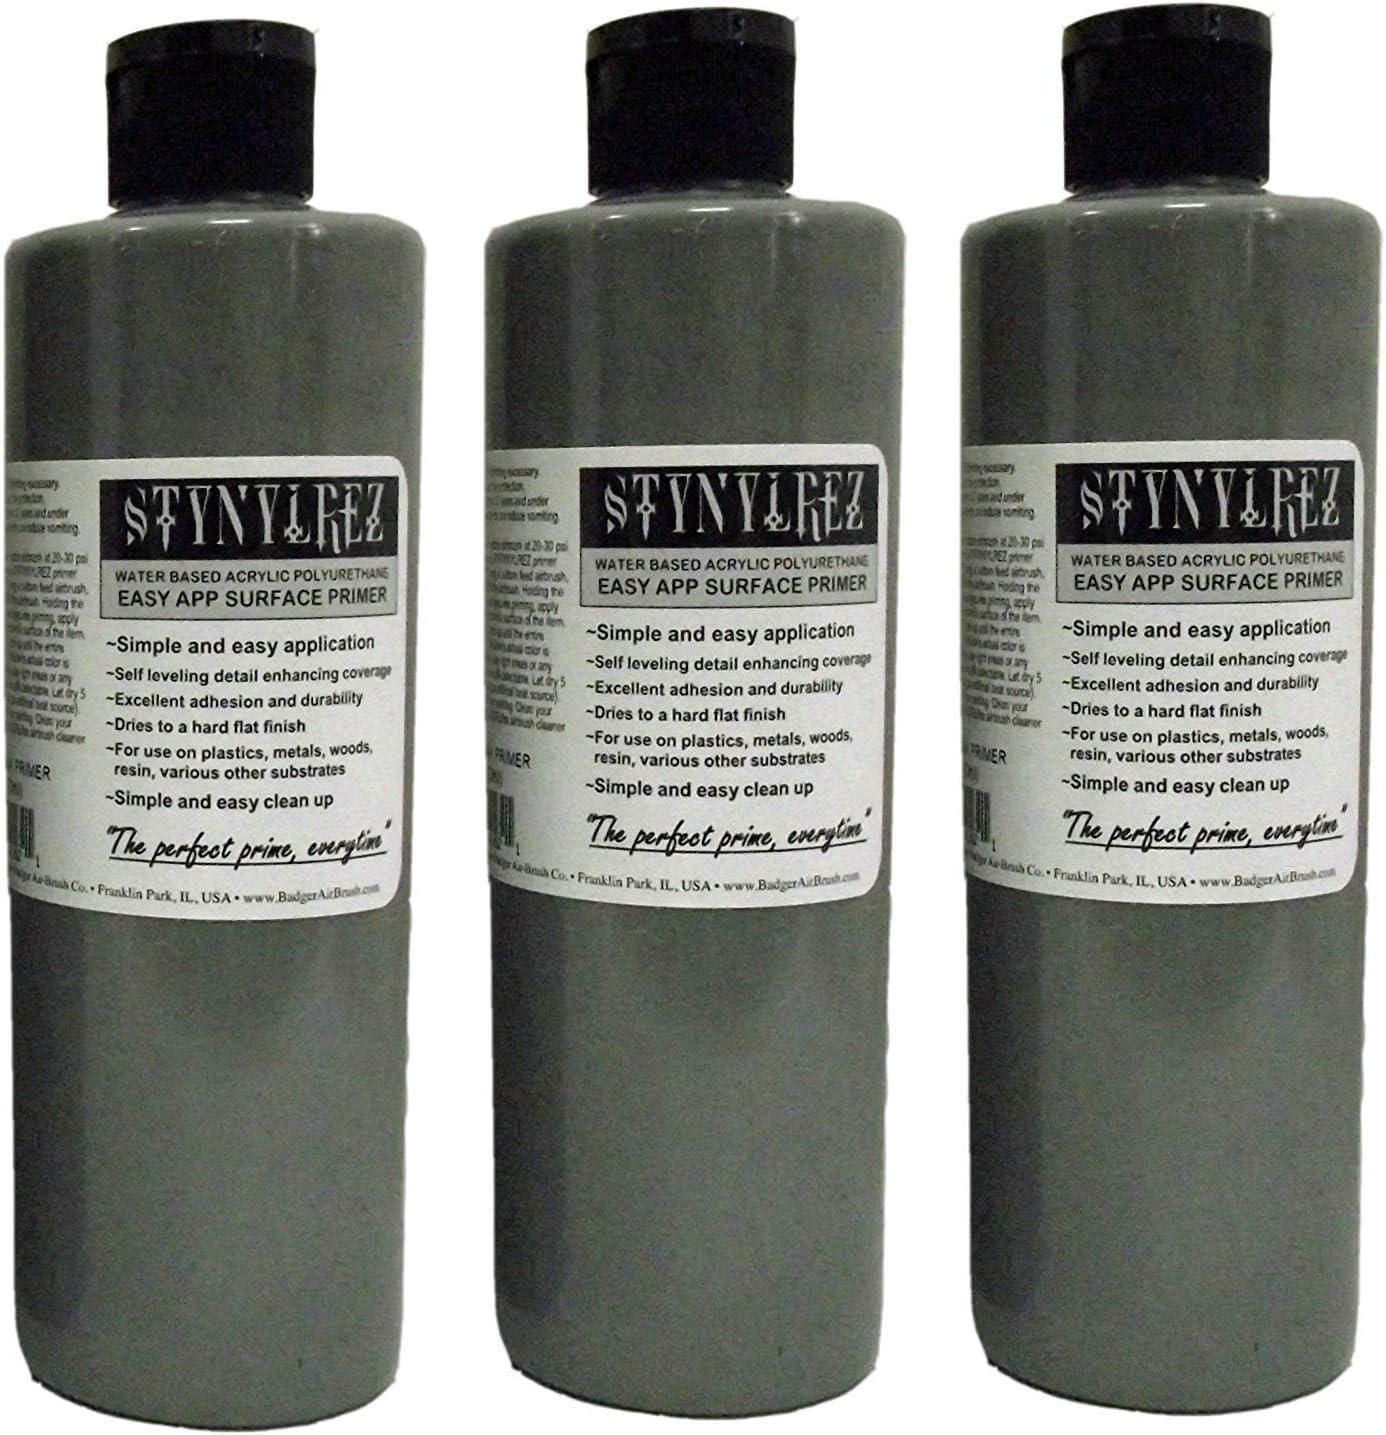 Badger Air-Brush Co. SNR-162 STYNYLREZ, 16 Ounce, Gray hr P ck